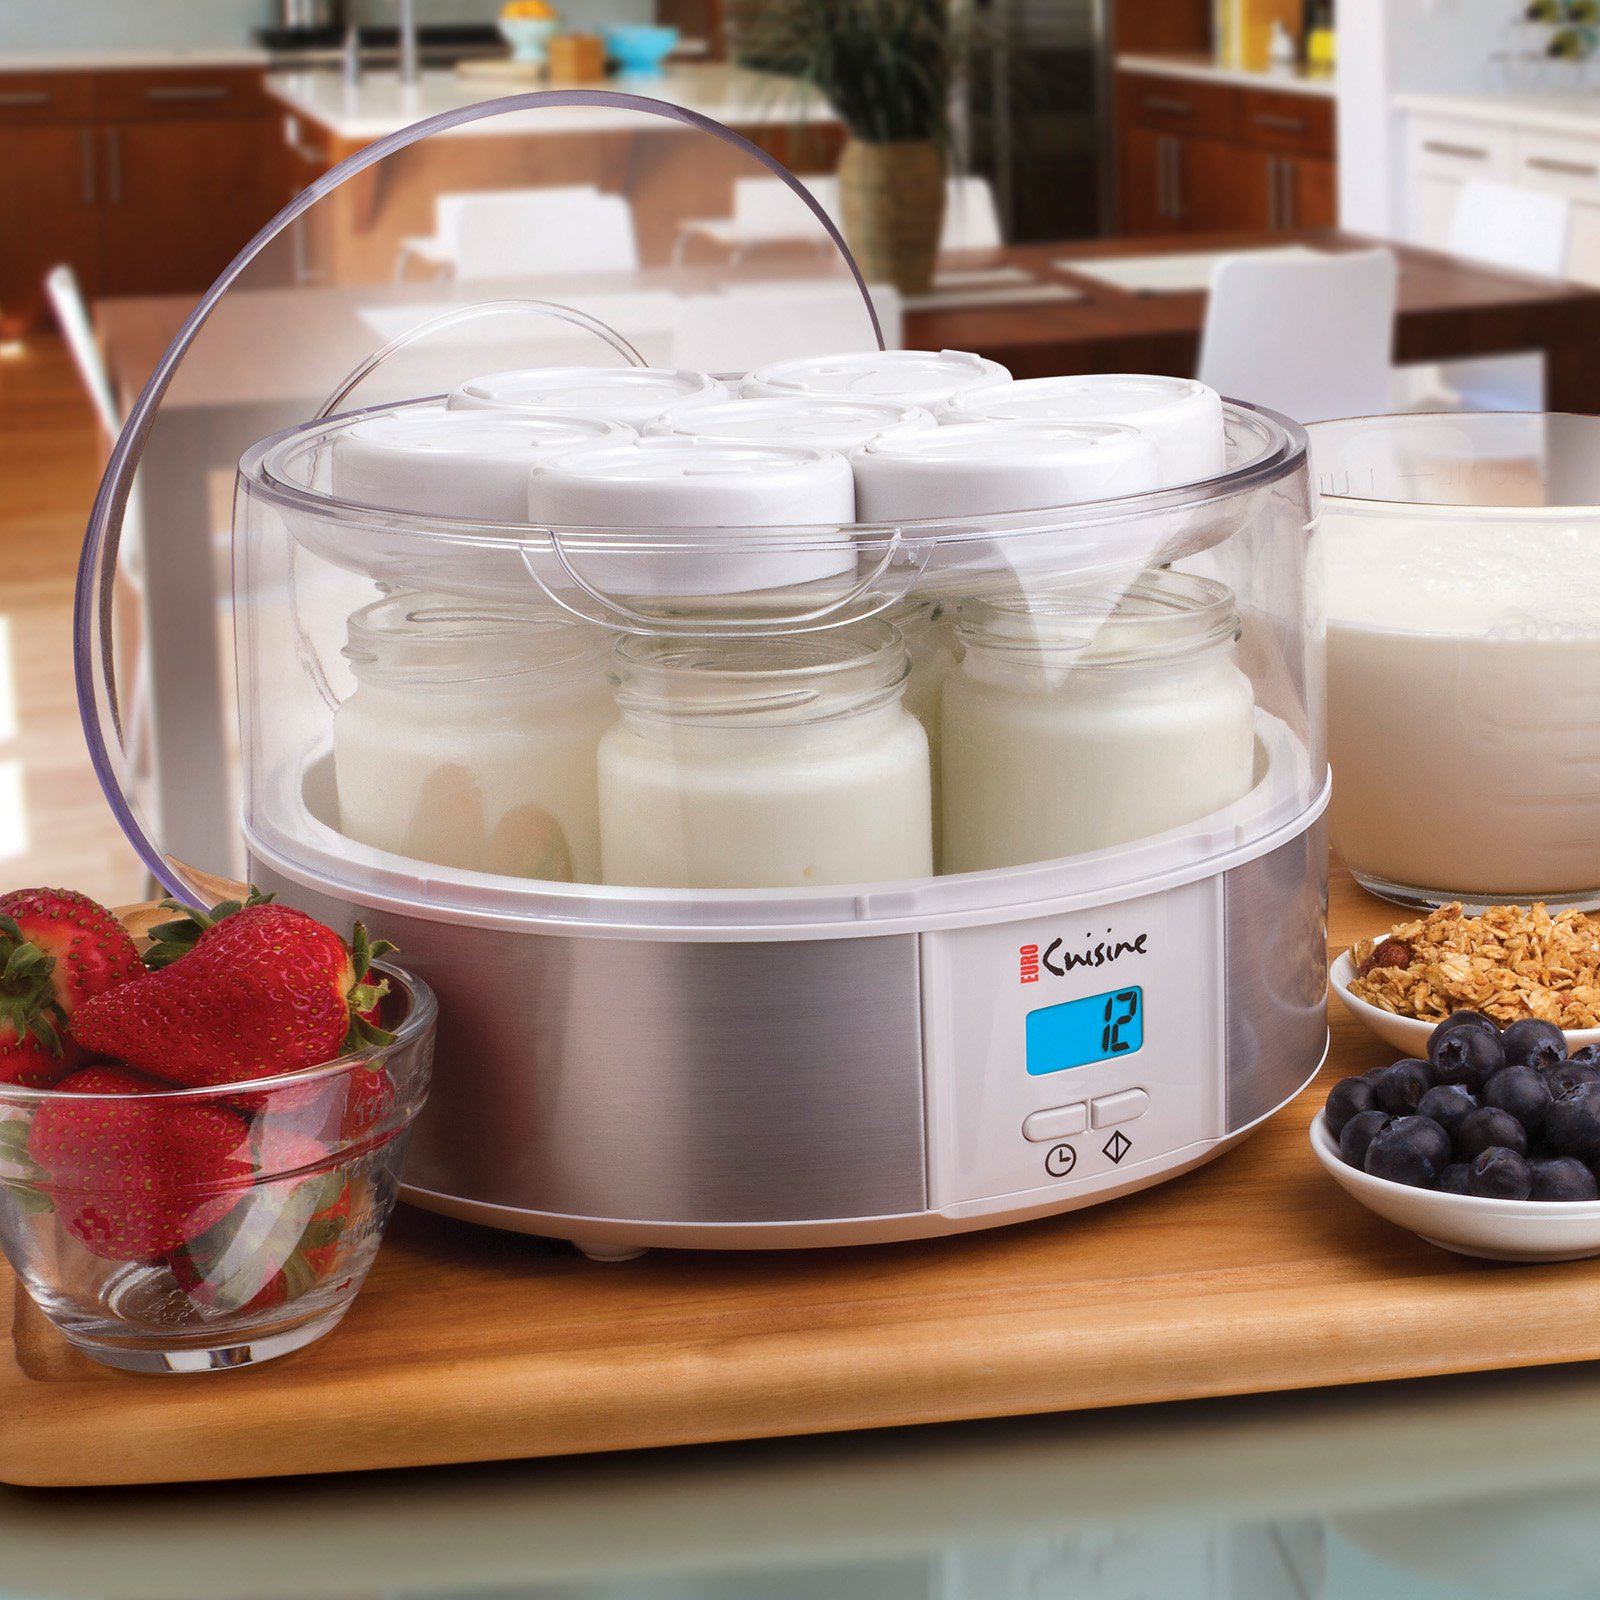 Euro Cuisine Automatic Yogurt Maker Walmart